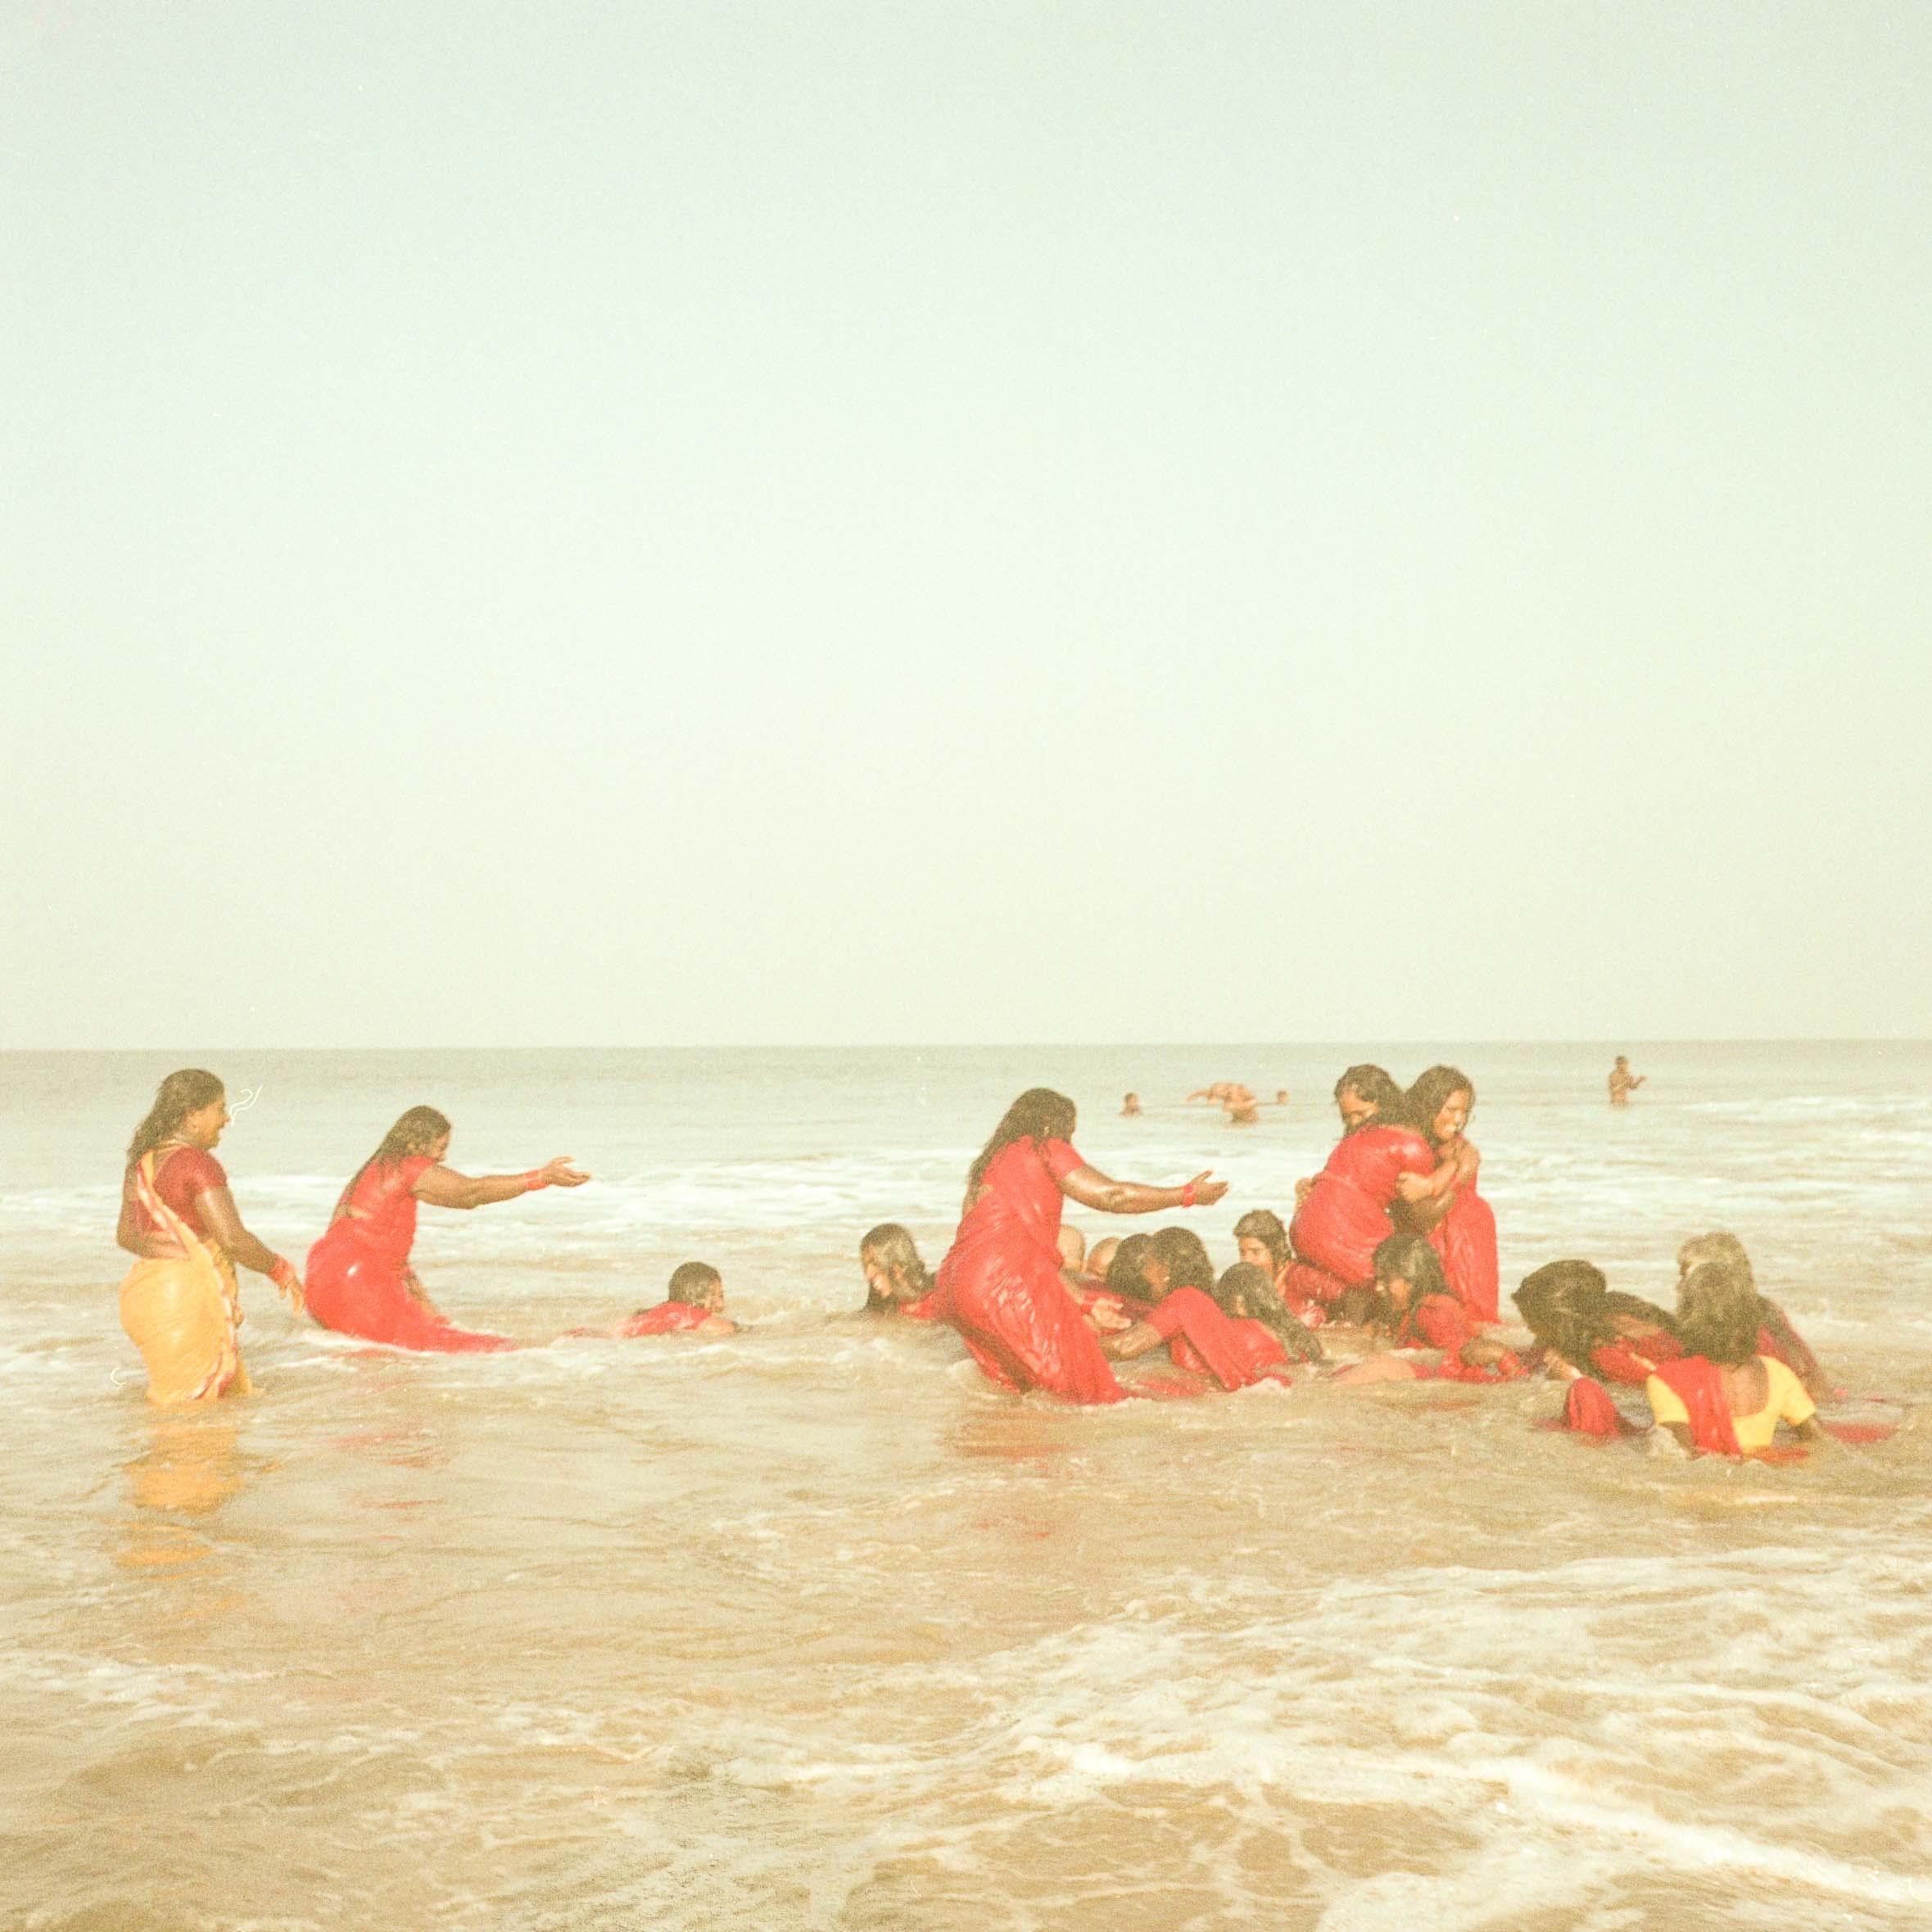 fine art photography, viaggio fotografico , seascape, travel photography, film photography, raffaele ferrari photography